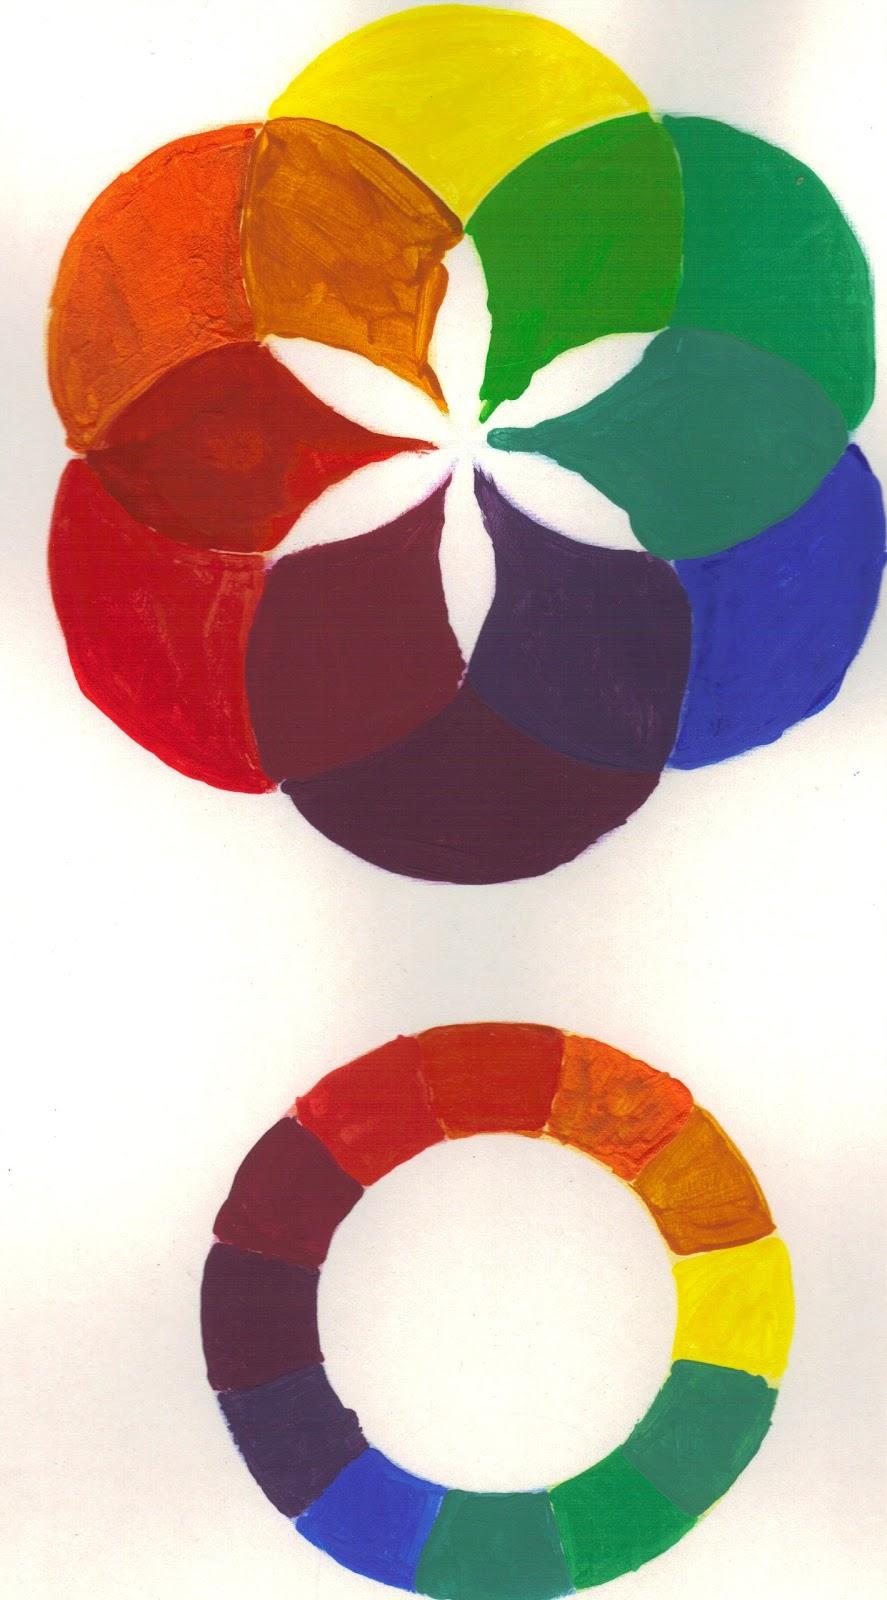 Psicología del color: La Rosa Cromatica